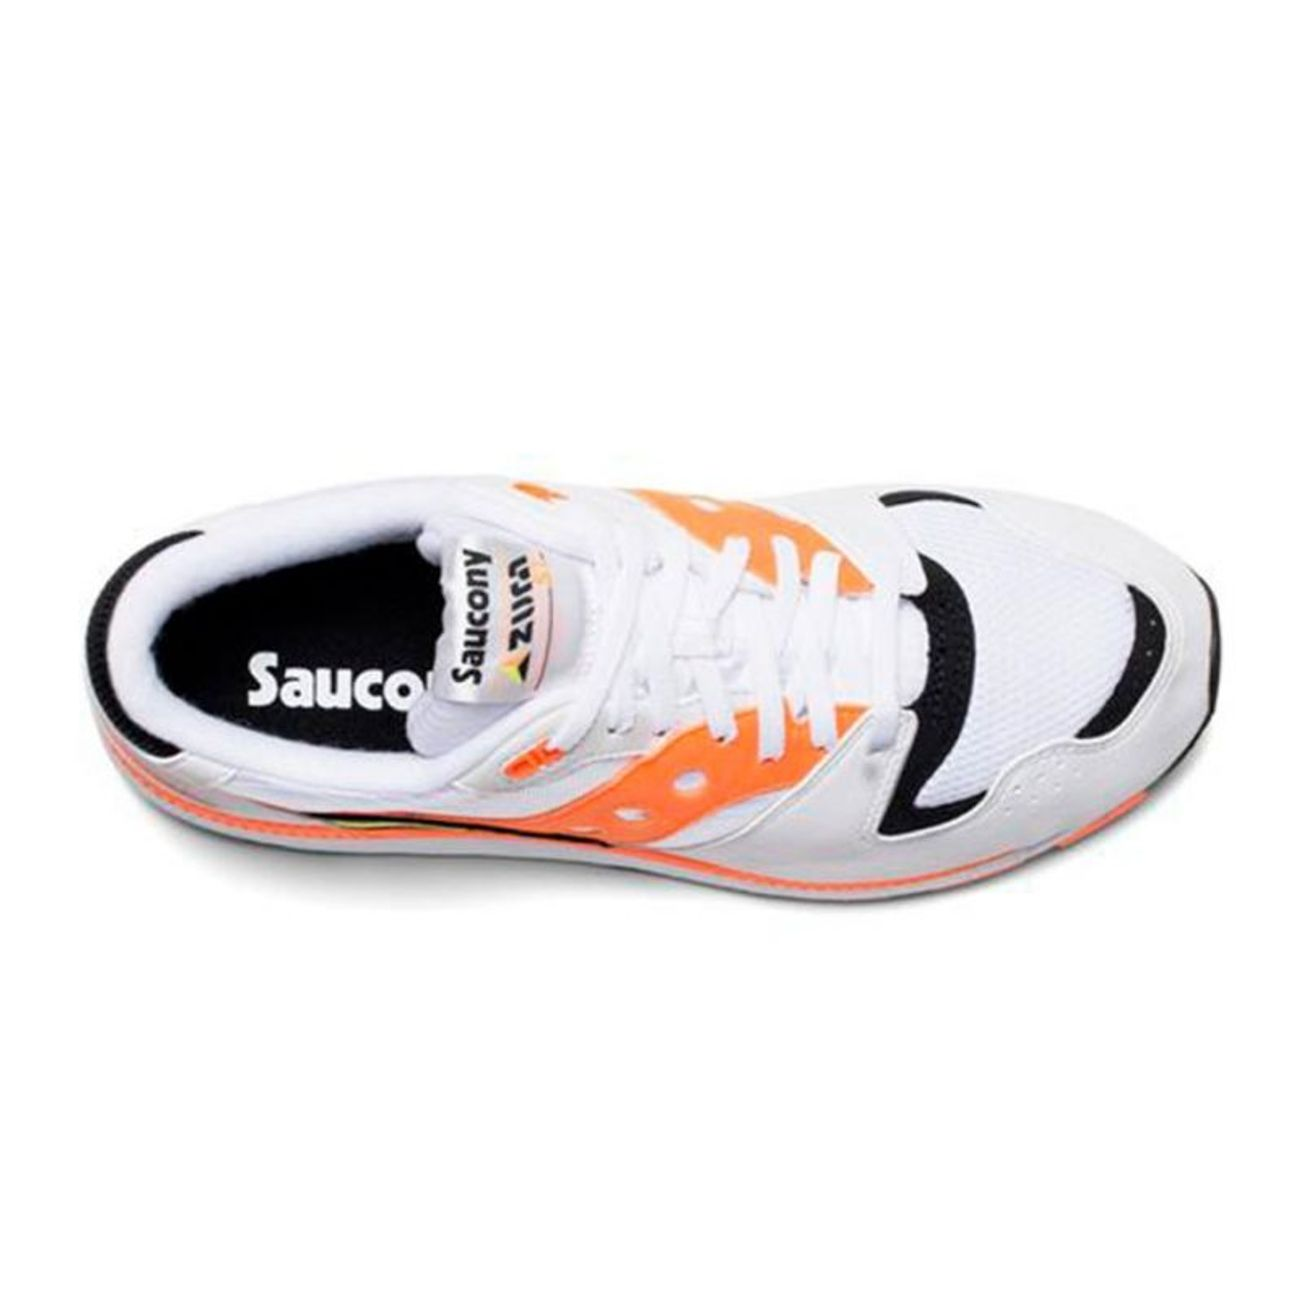 Padel Saucony Adulte S70437 Blanc Azura Orange 2 Tl1FKJc